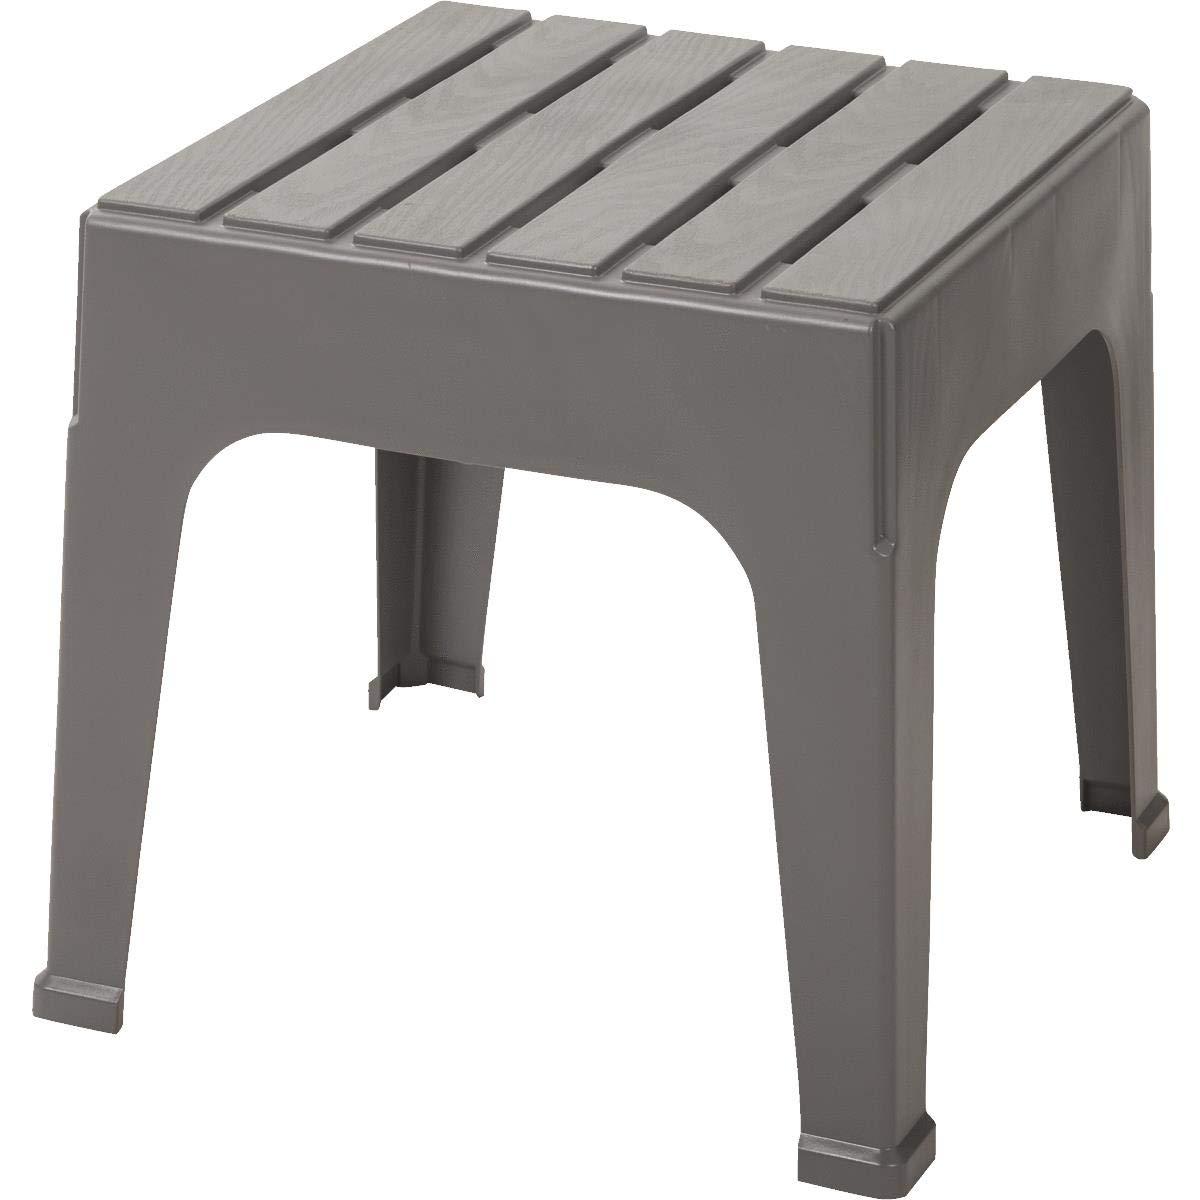 Adams Big Easy Square Gray Polypropylene Stackable Side Table